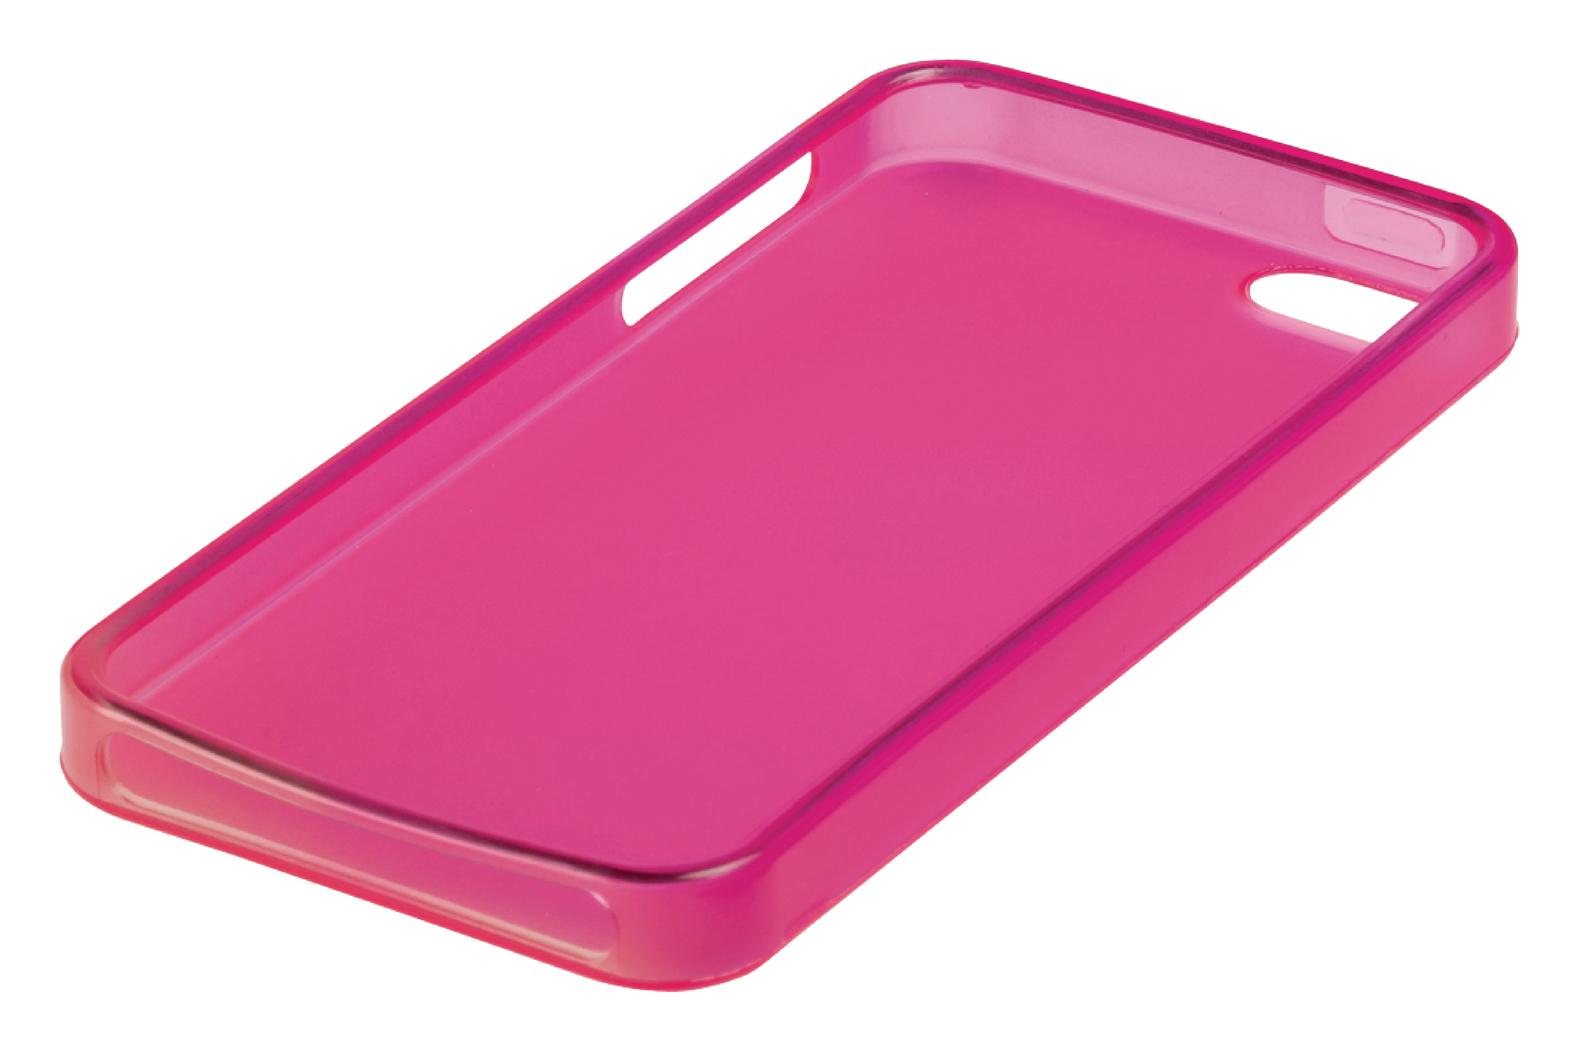 Gelhoes iPhone 6 Plus roze